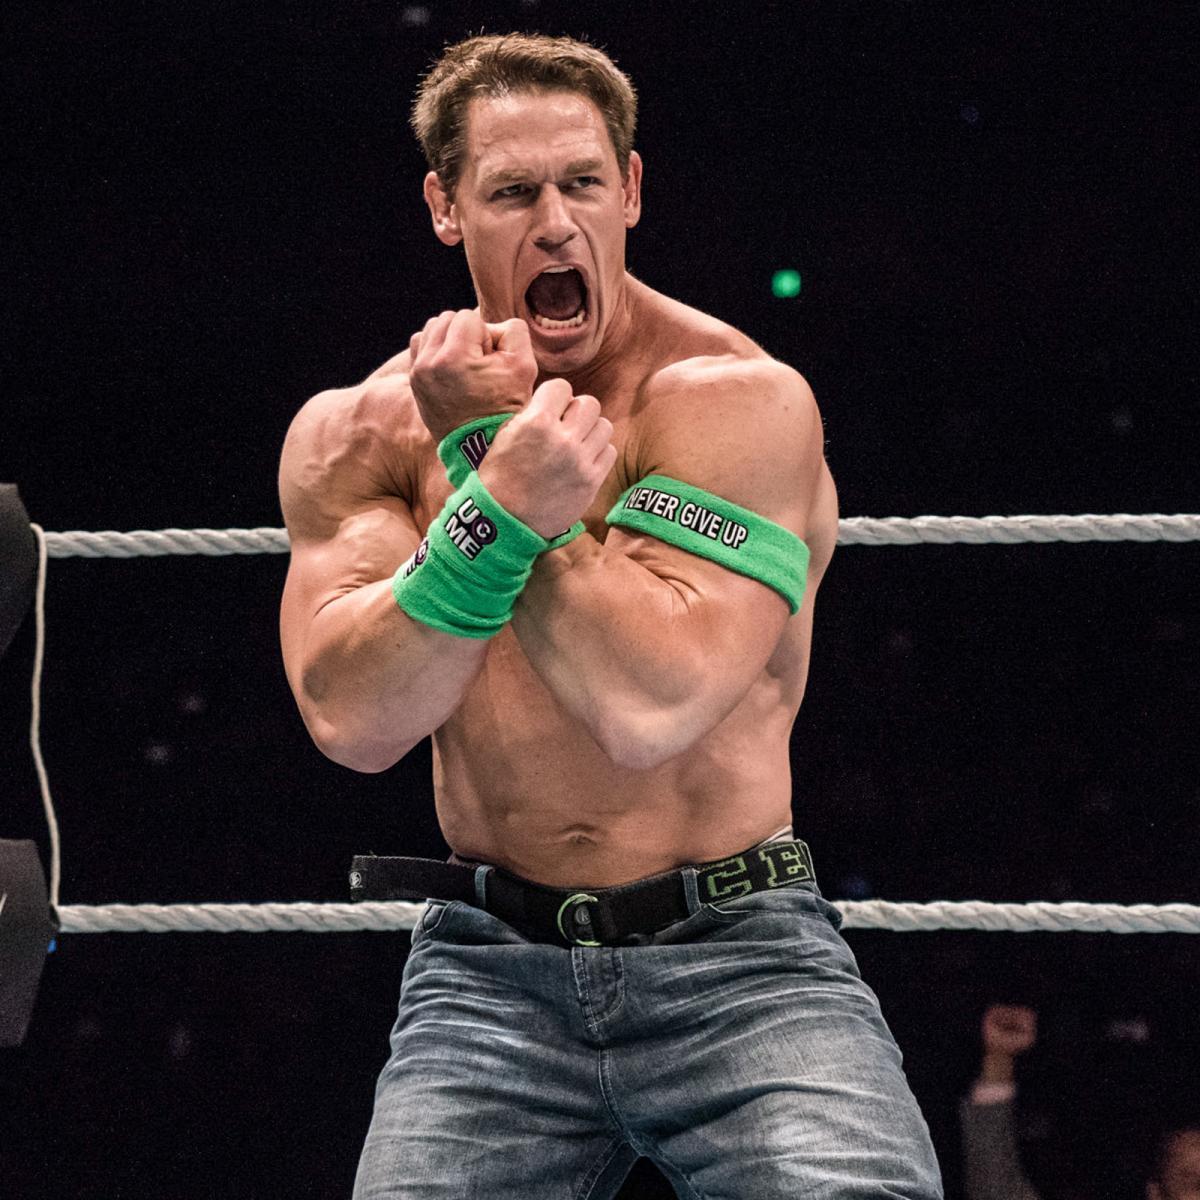 John Cena Says Steroid Users Like A Rod Should Go To Jail